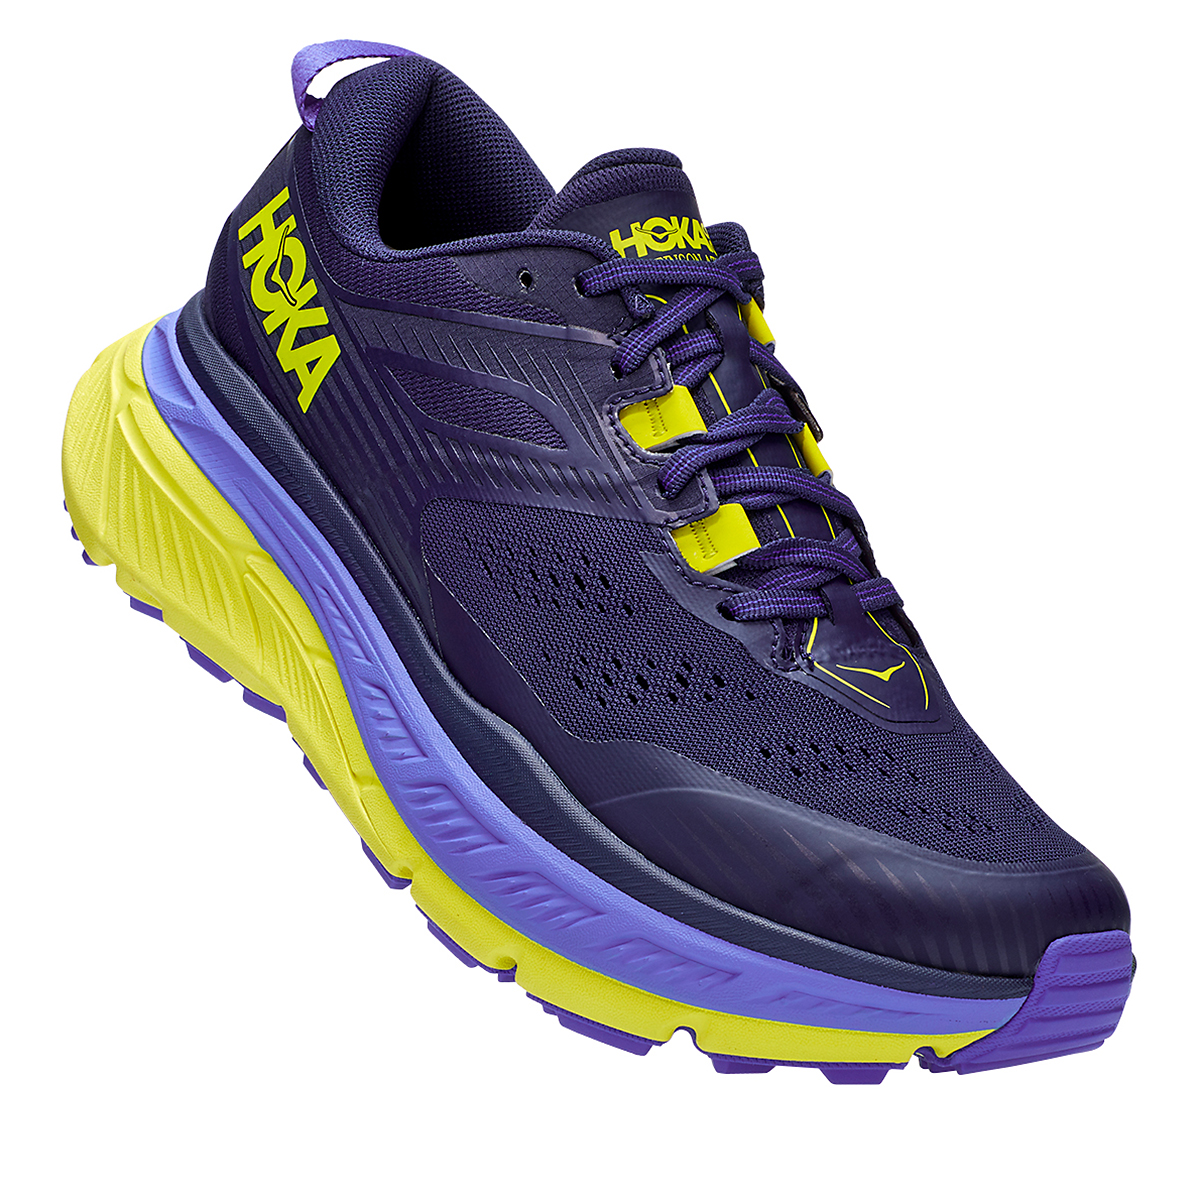 Men's Hoka One One Stinson Atr 6 Trail Running Shoe - Color: Black Iris/Evening Primrose - Size: 7 - Width: Regular, Black Iris/Evening Primrose, large, image 4